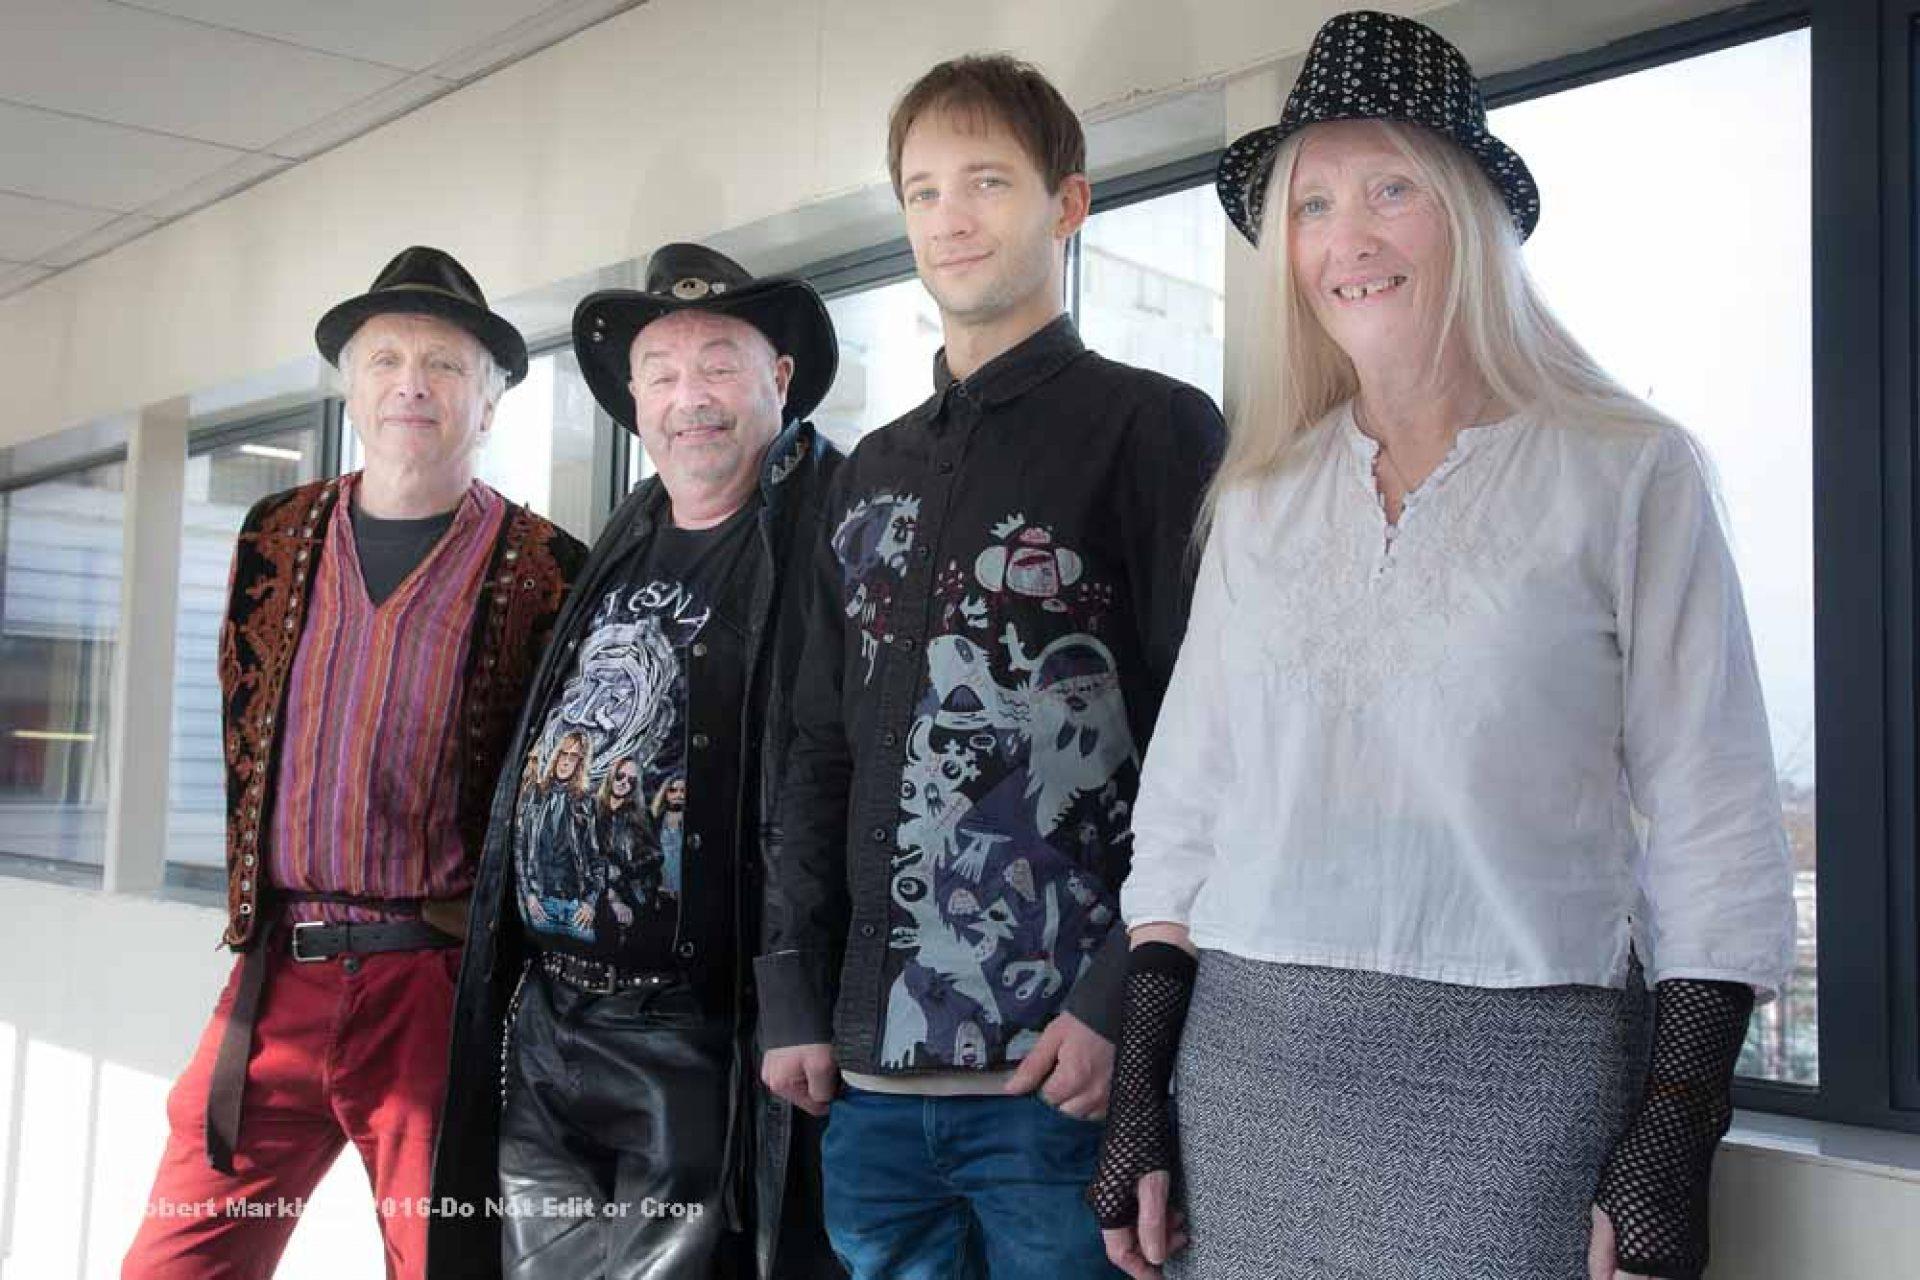 The Legendary Pete Fryer Band